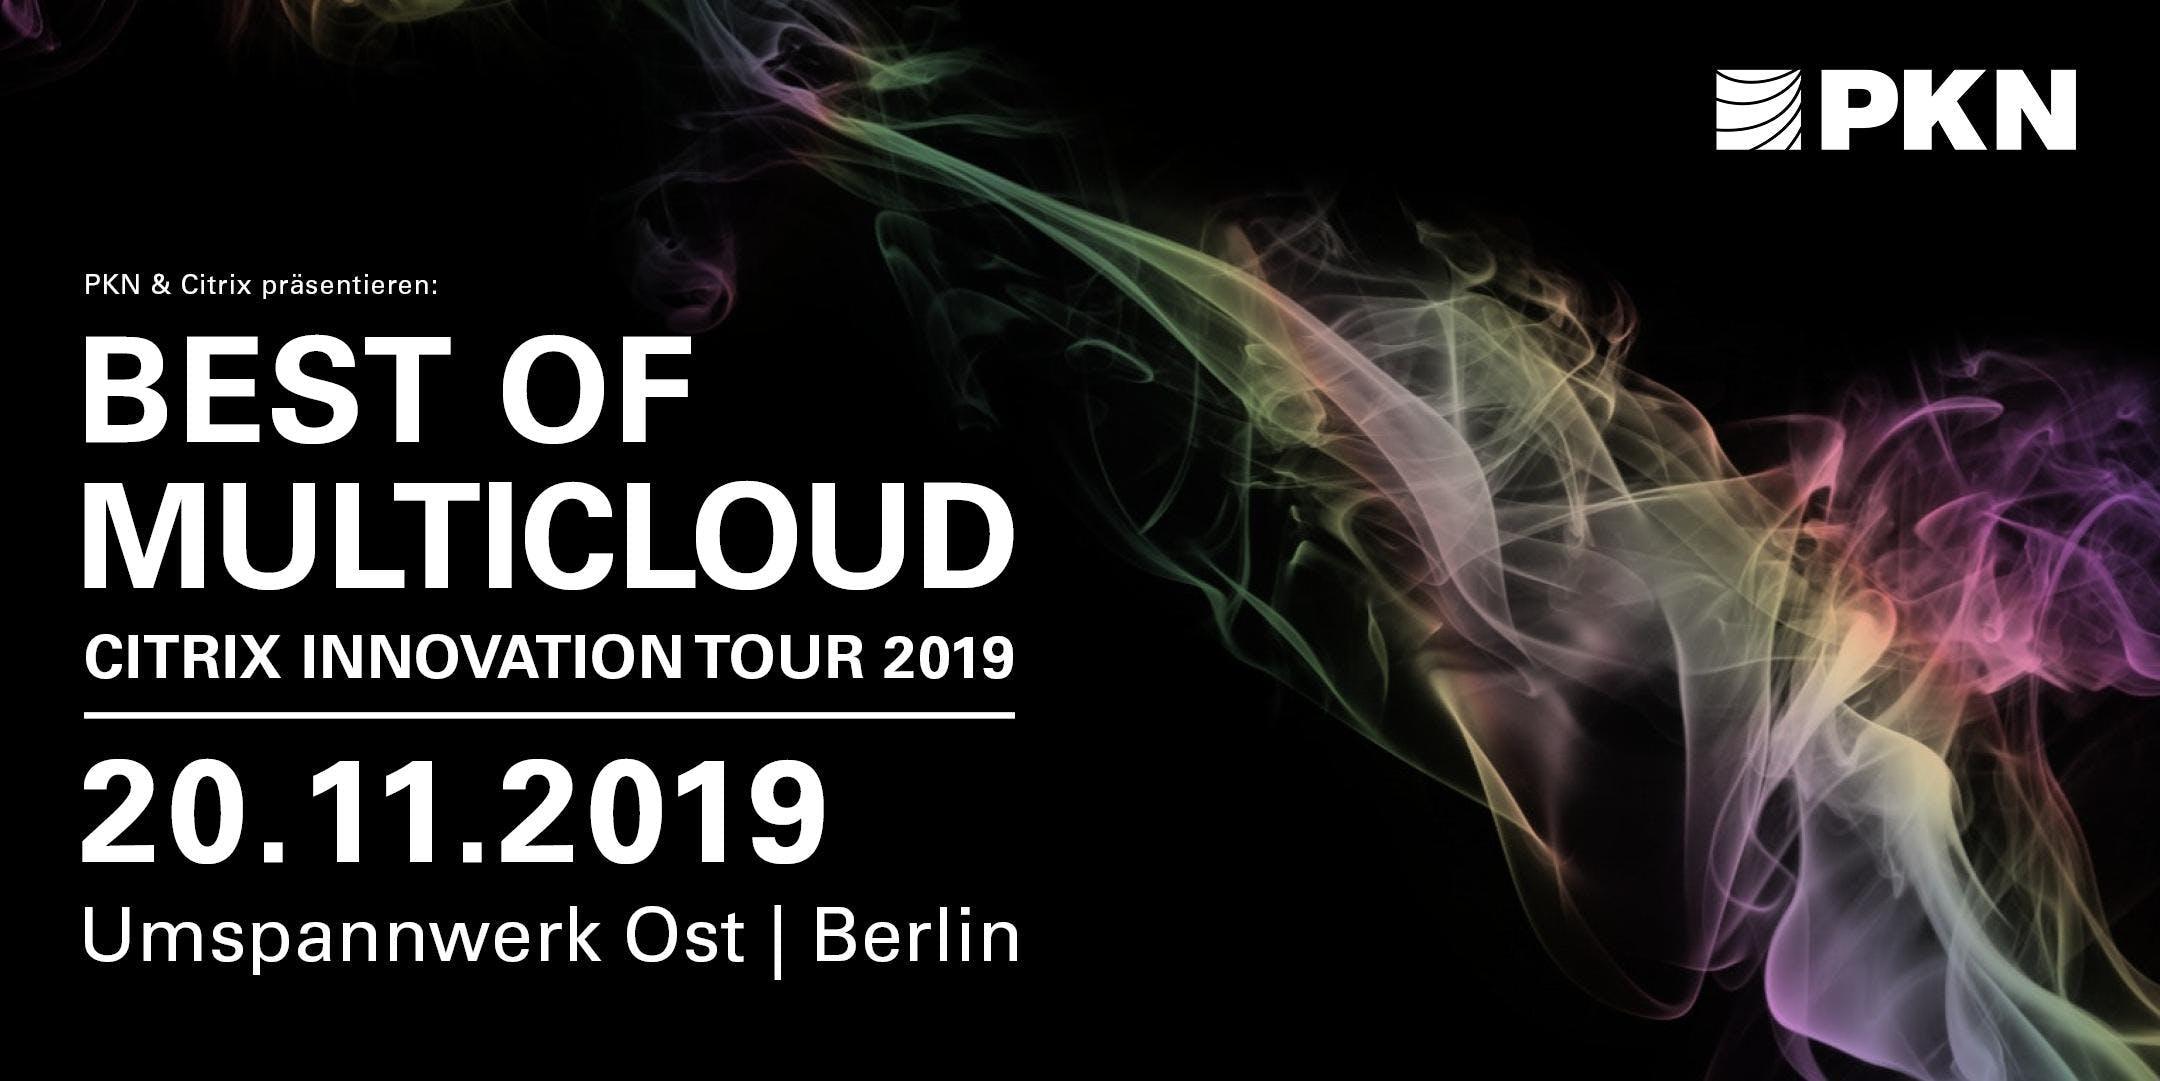 Citrix Innovation Tour 2019 in Berlin